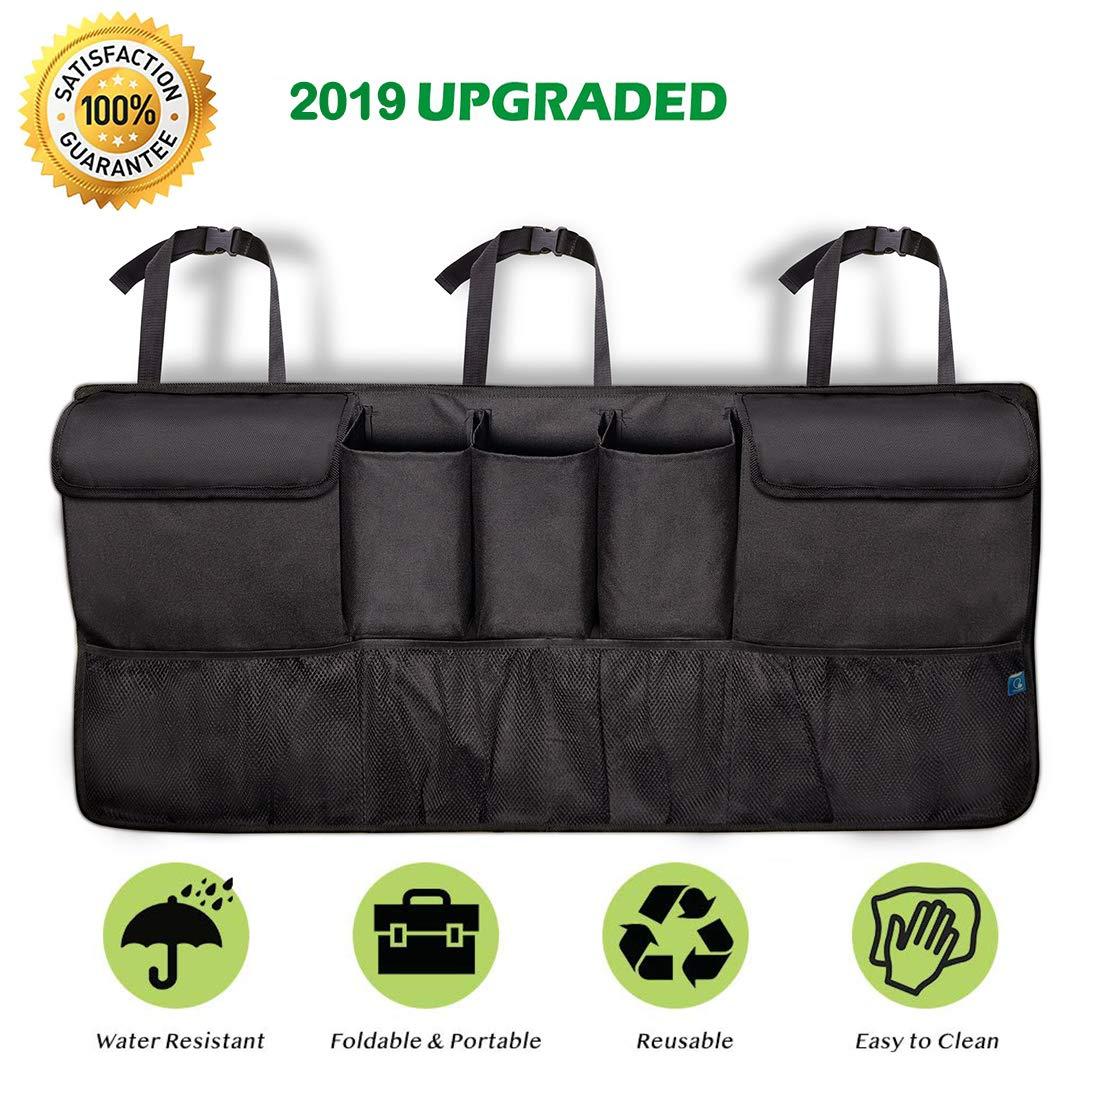 Car Backseat Organizer for SUV Van Container COOLBEBE Trunk Organizer Car Storage Auto Organizer with 5 Deep Pockets /& 4 Pockets Mesh Quality